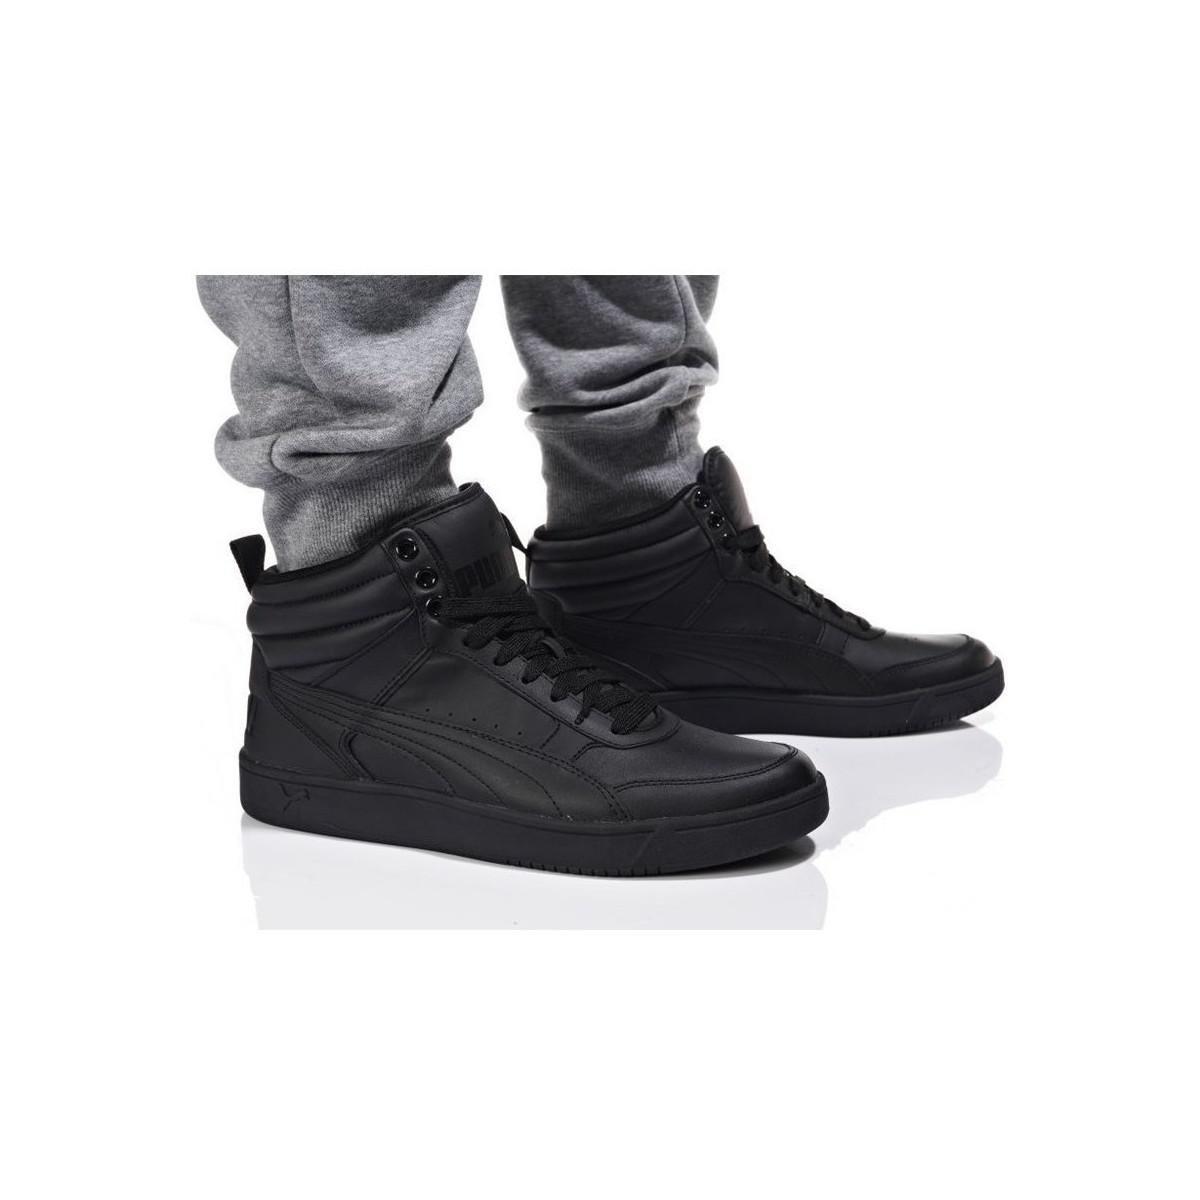 Street Top Puma V2 L Men's Shoeshigh Rebound TrainersIn Black EDH29WI